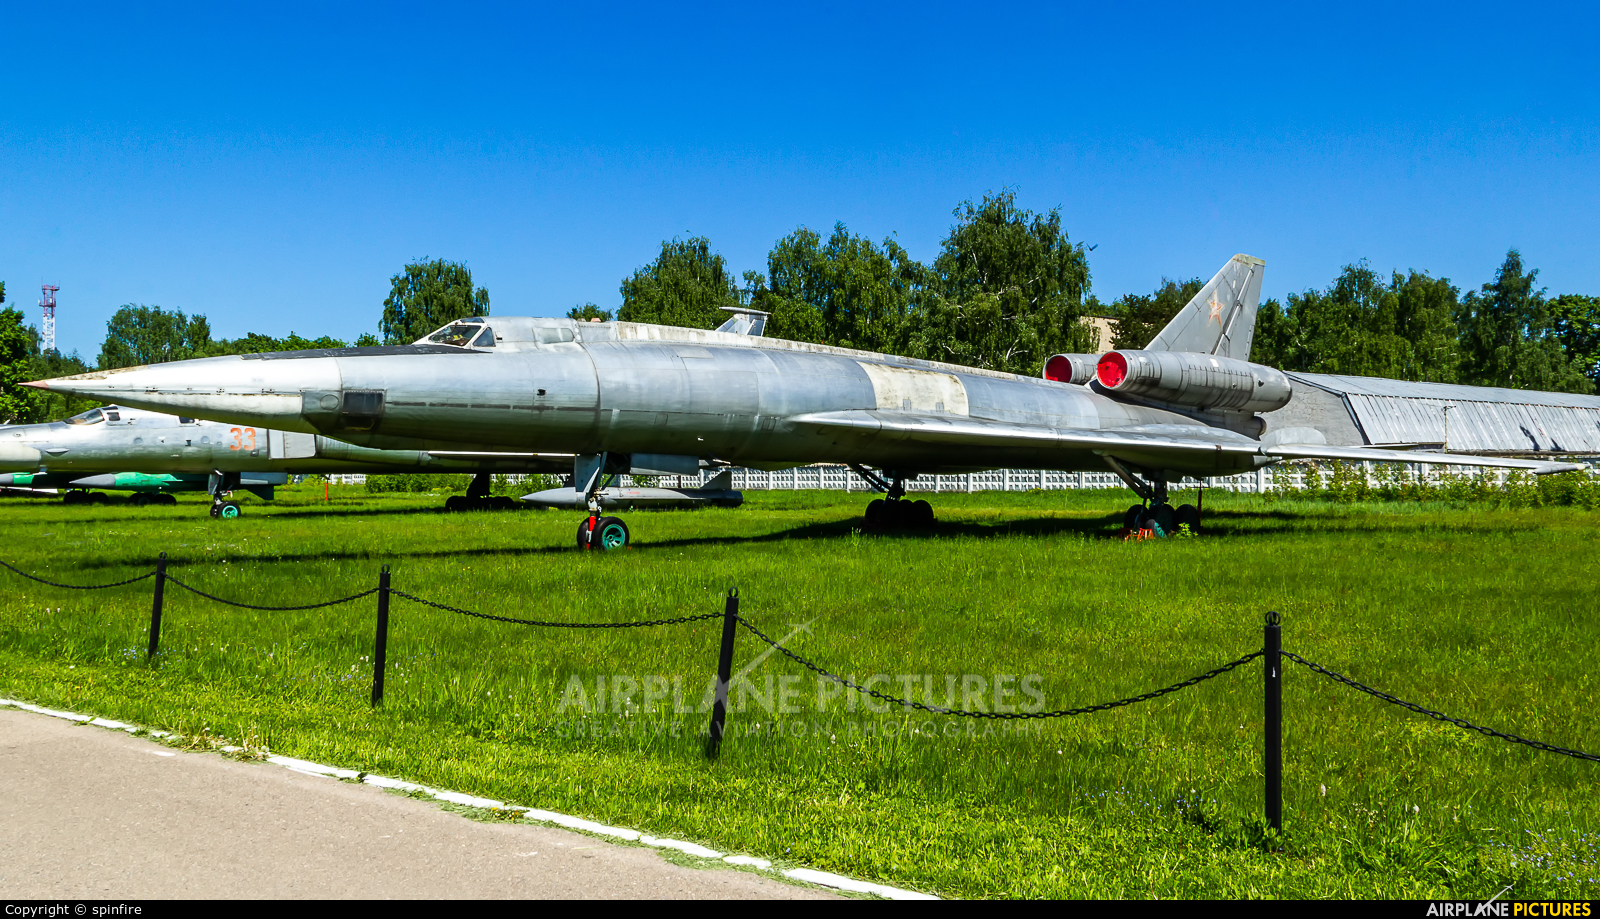 Russia - Air Force 32 aircraft at Monino Russian Air Force museum